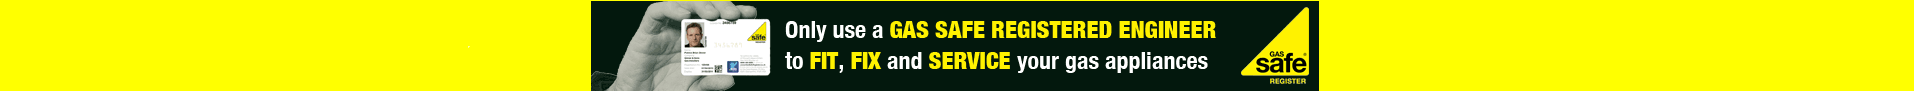 GAS SAFE BANNER